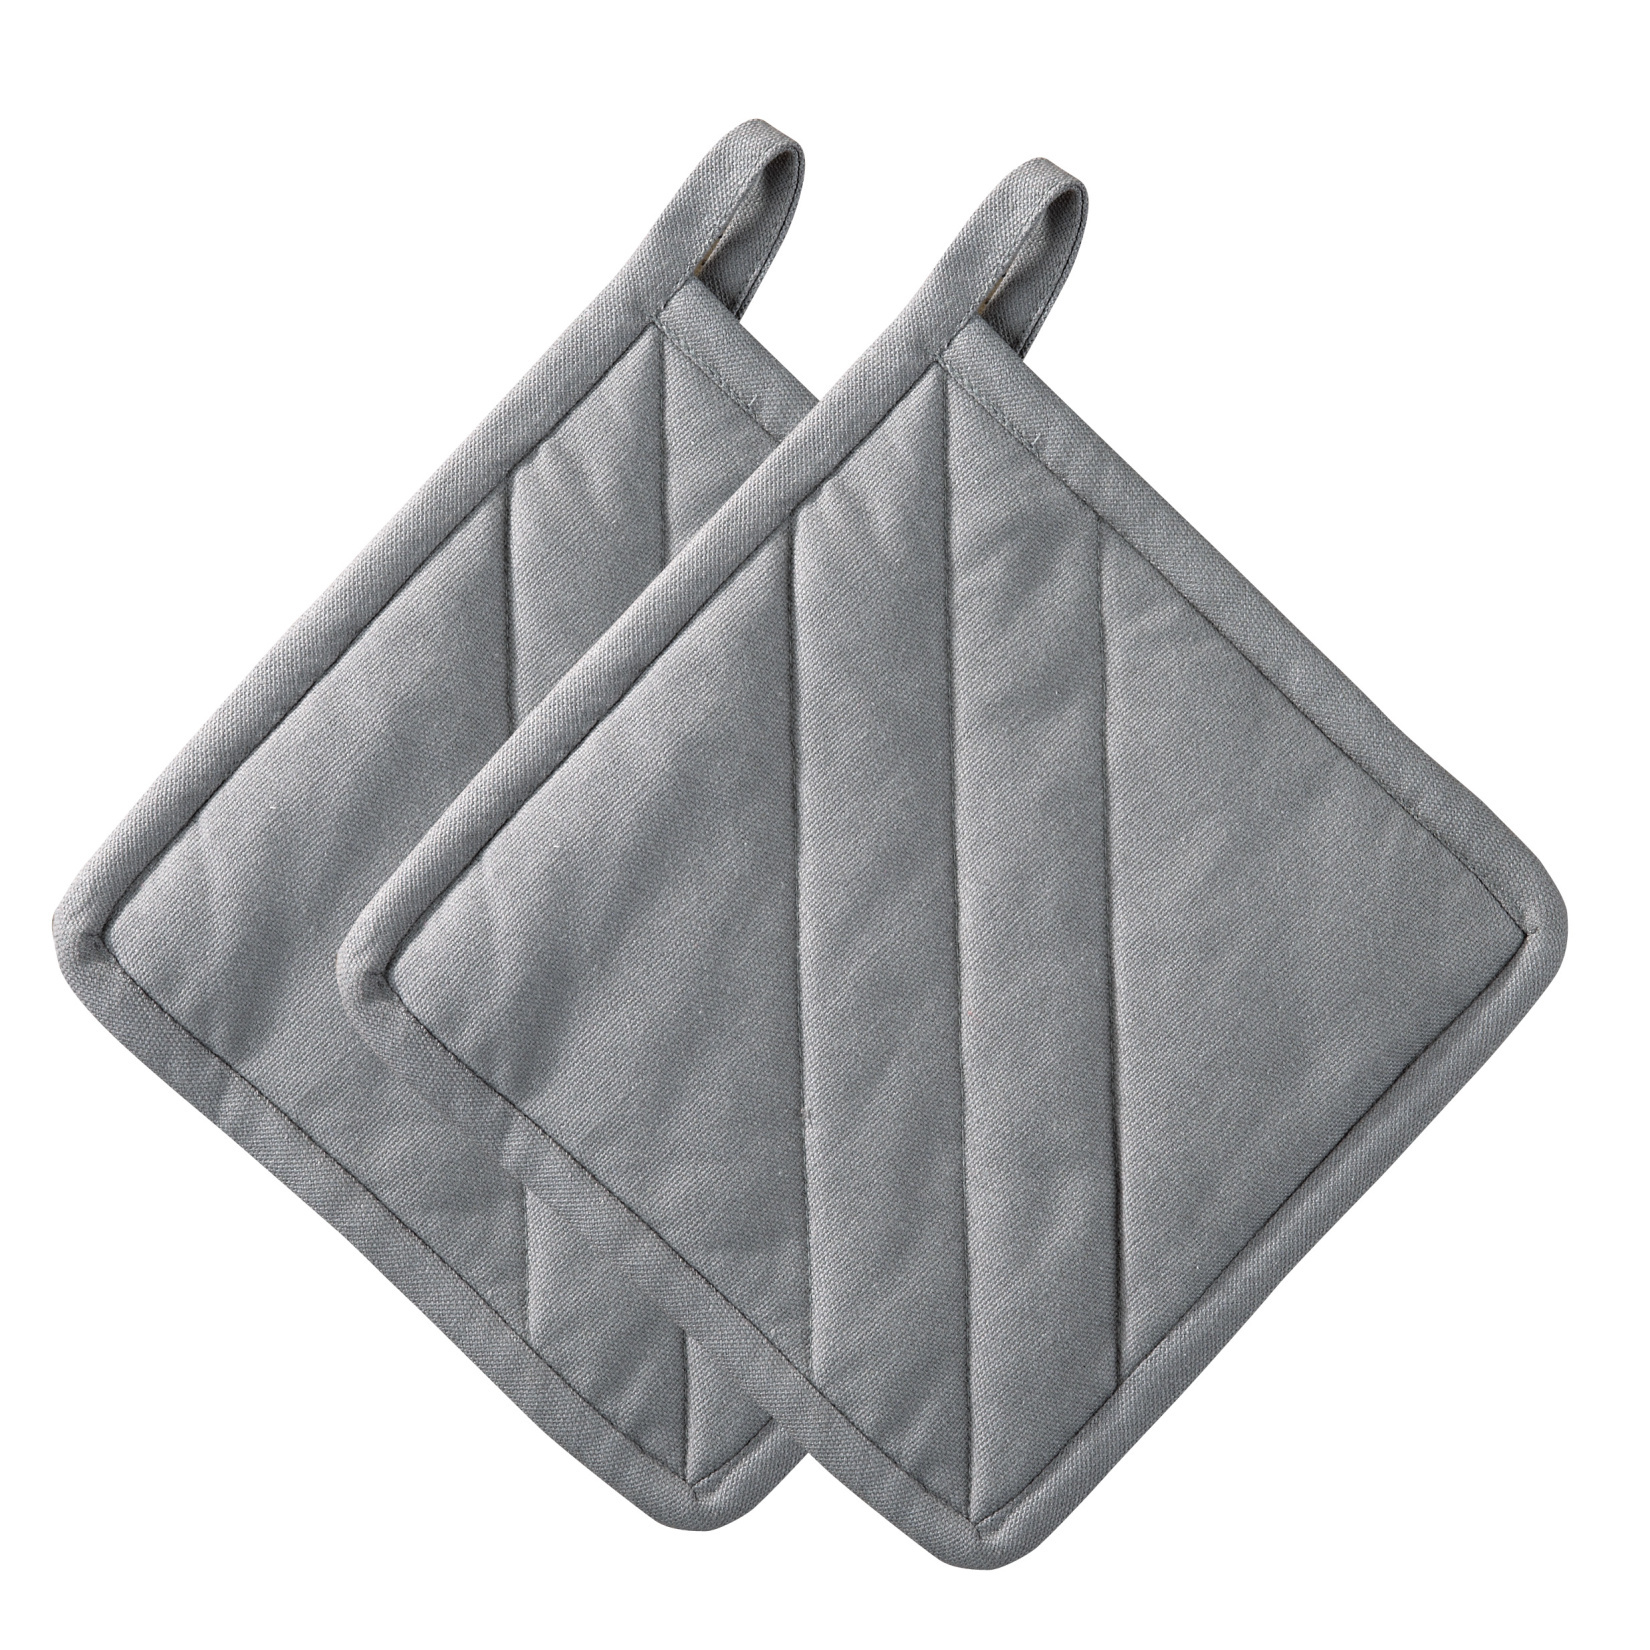 Kuchyňské chňapky 2 ks, šedé, Confetti - Zone Denmark